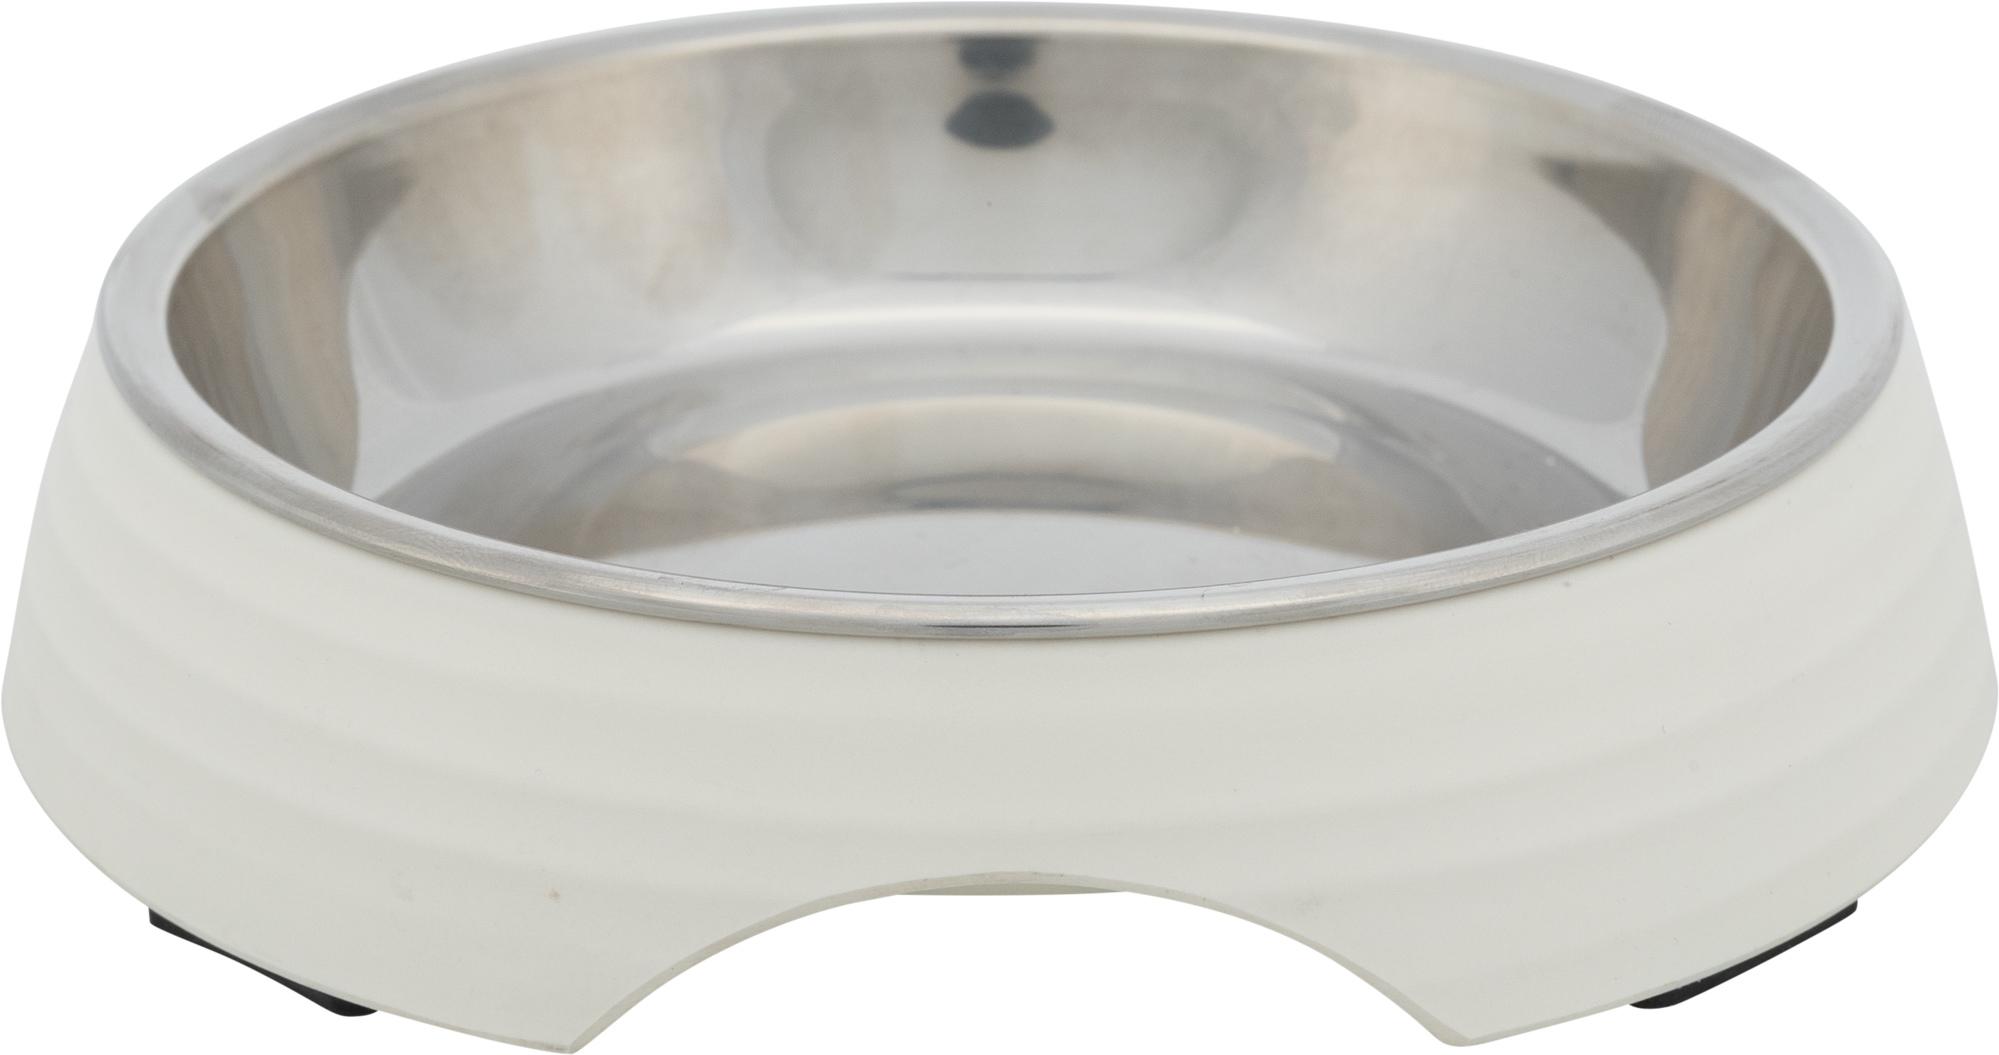 TRIXIE Napf, Melamin/Edelstahl, 0,2 l/ø 14 cm, weiß